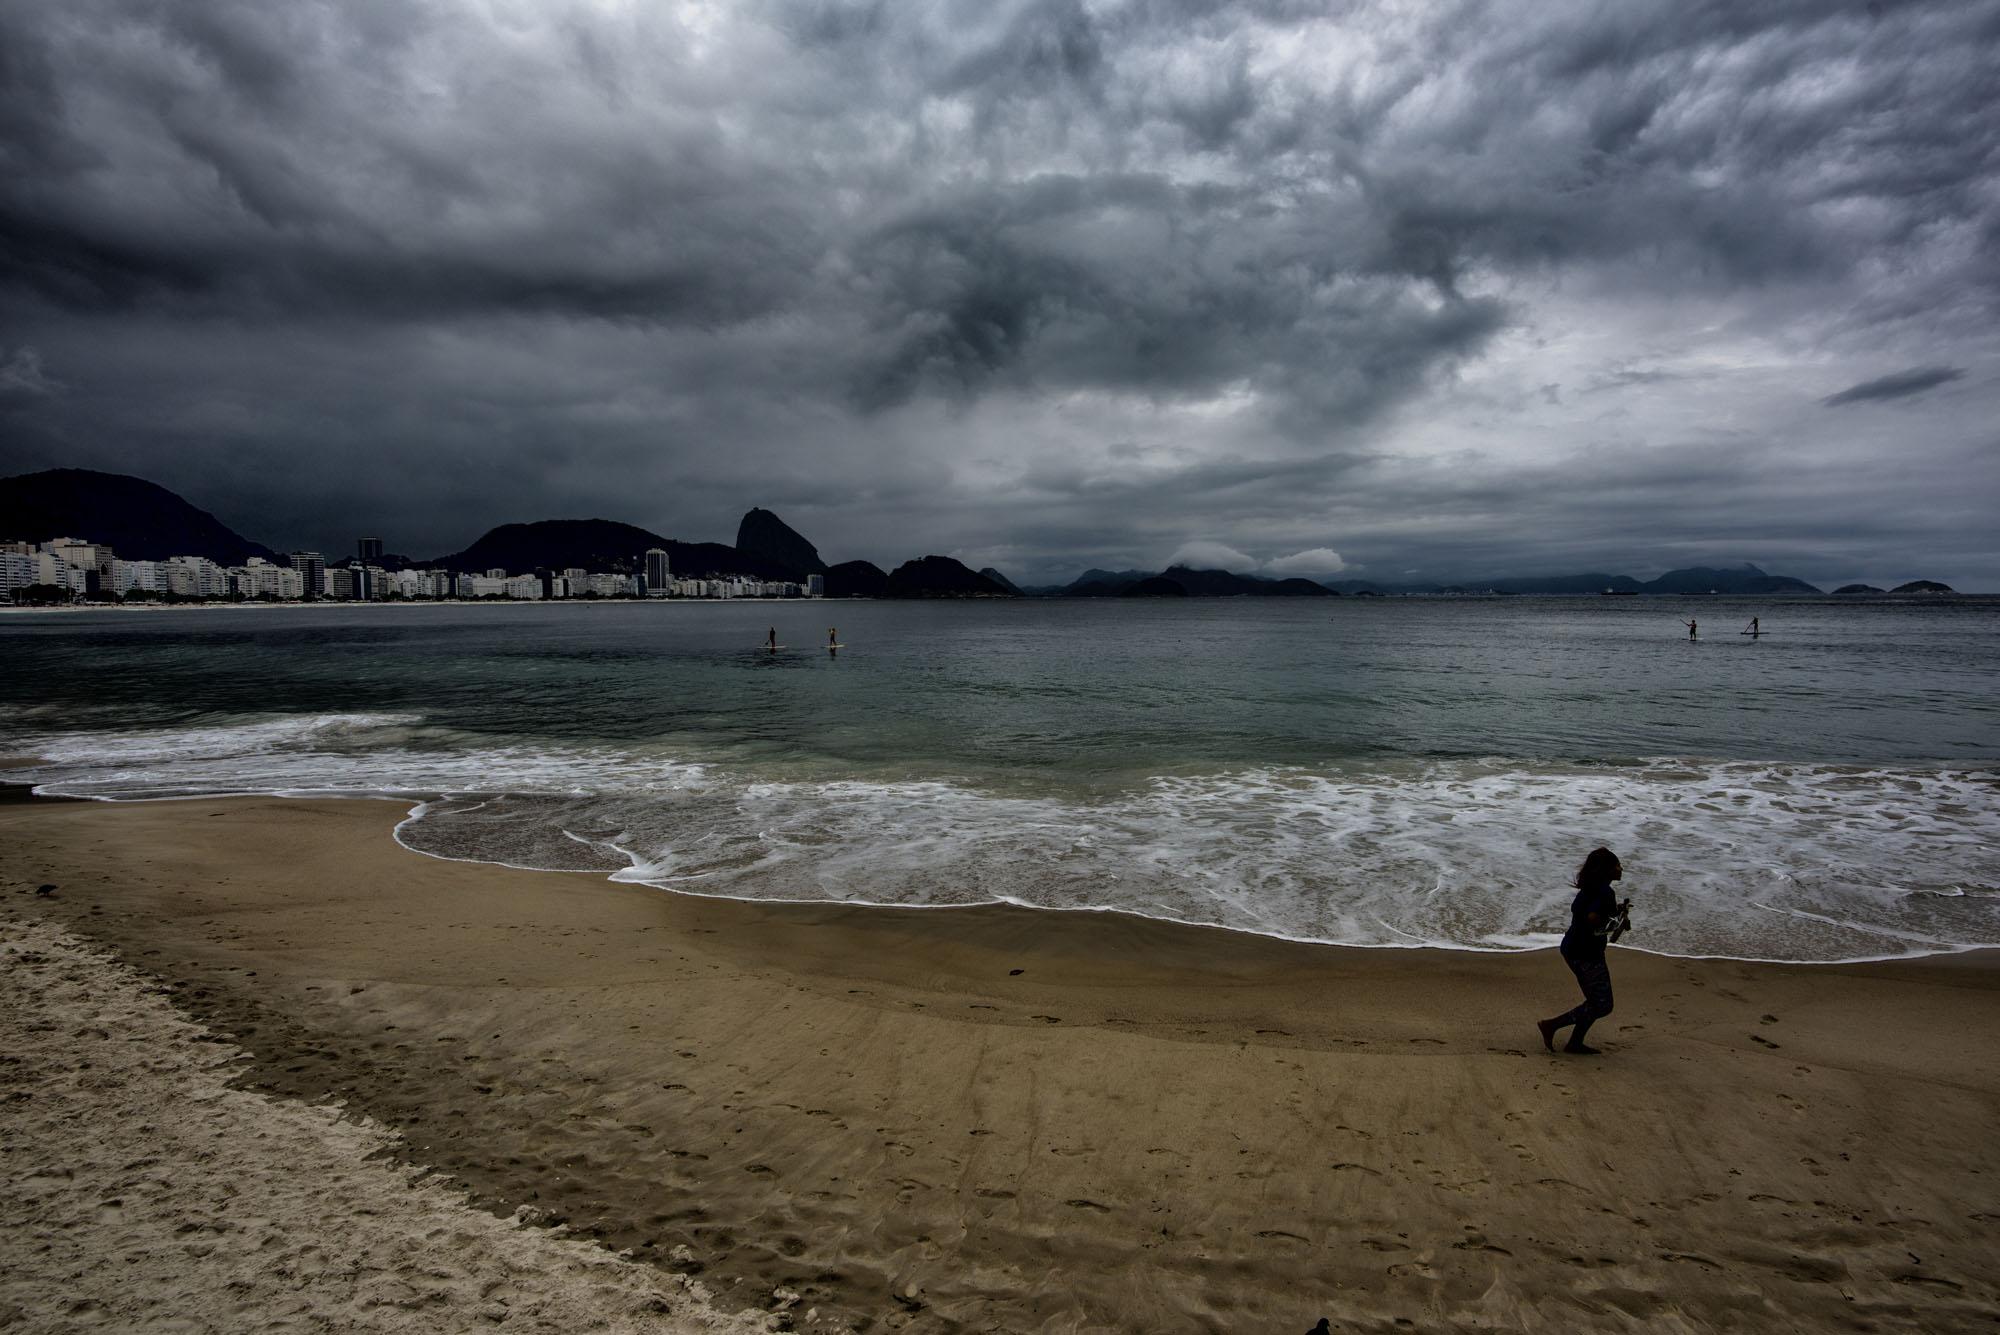 Copacabana. Rio de Janeiro, Brazil.